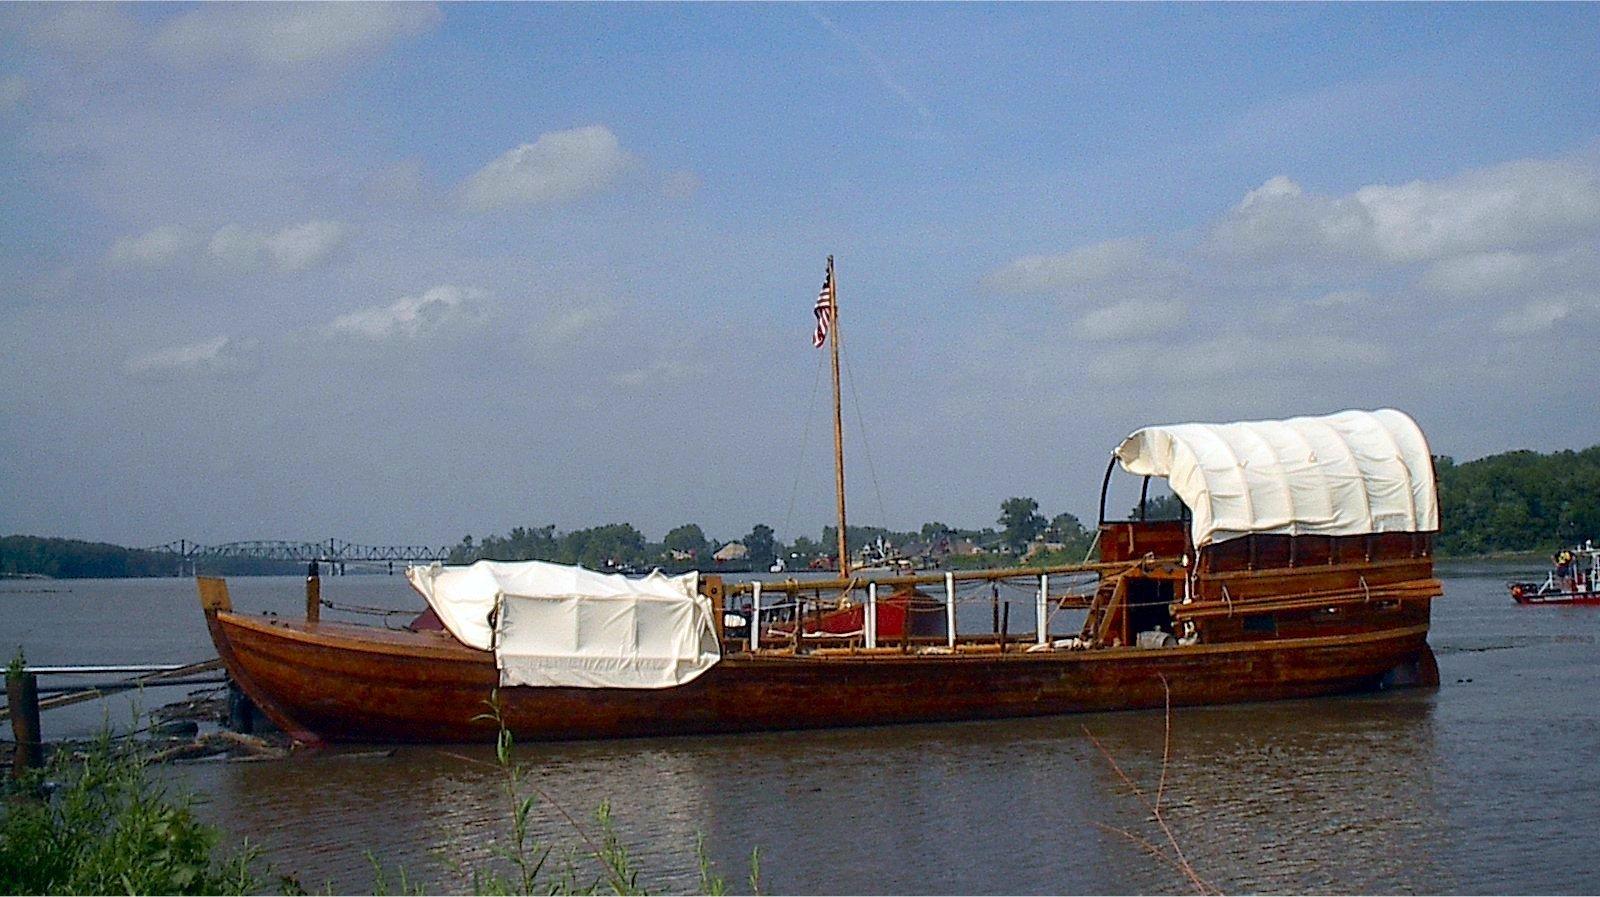 keelboat_05202004_alr-7769.jpg